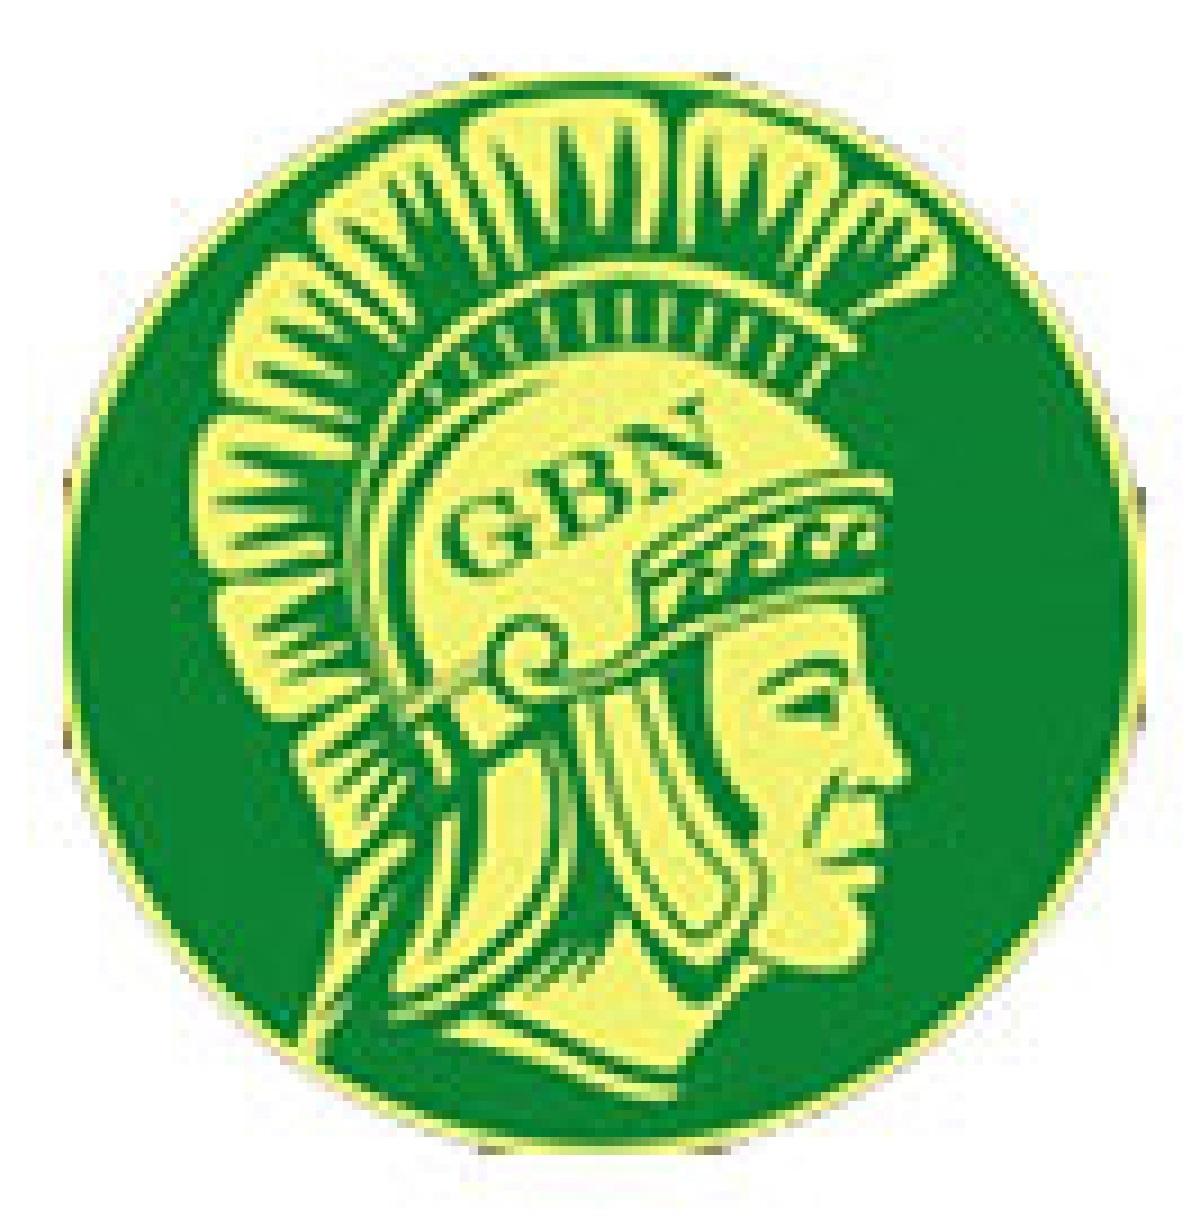 GBN logo of a man's head with a roman helmet,